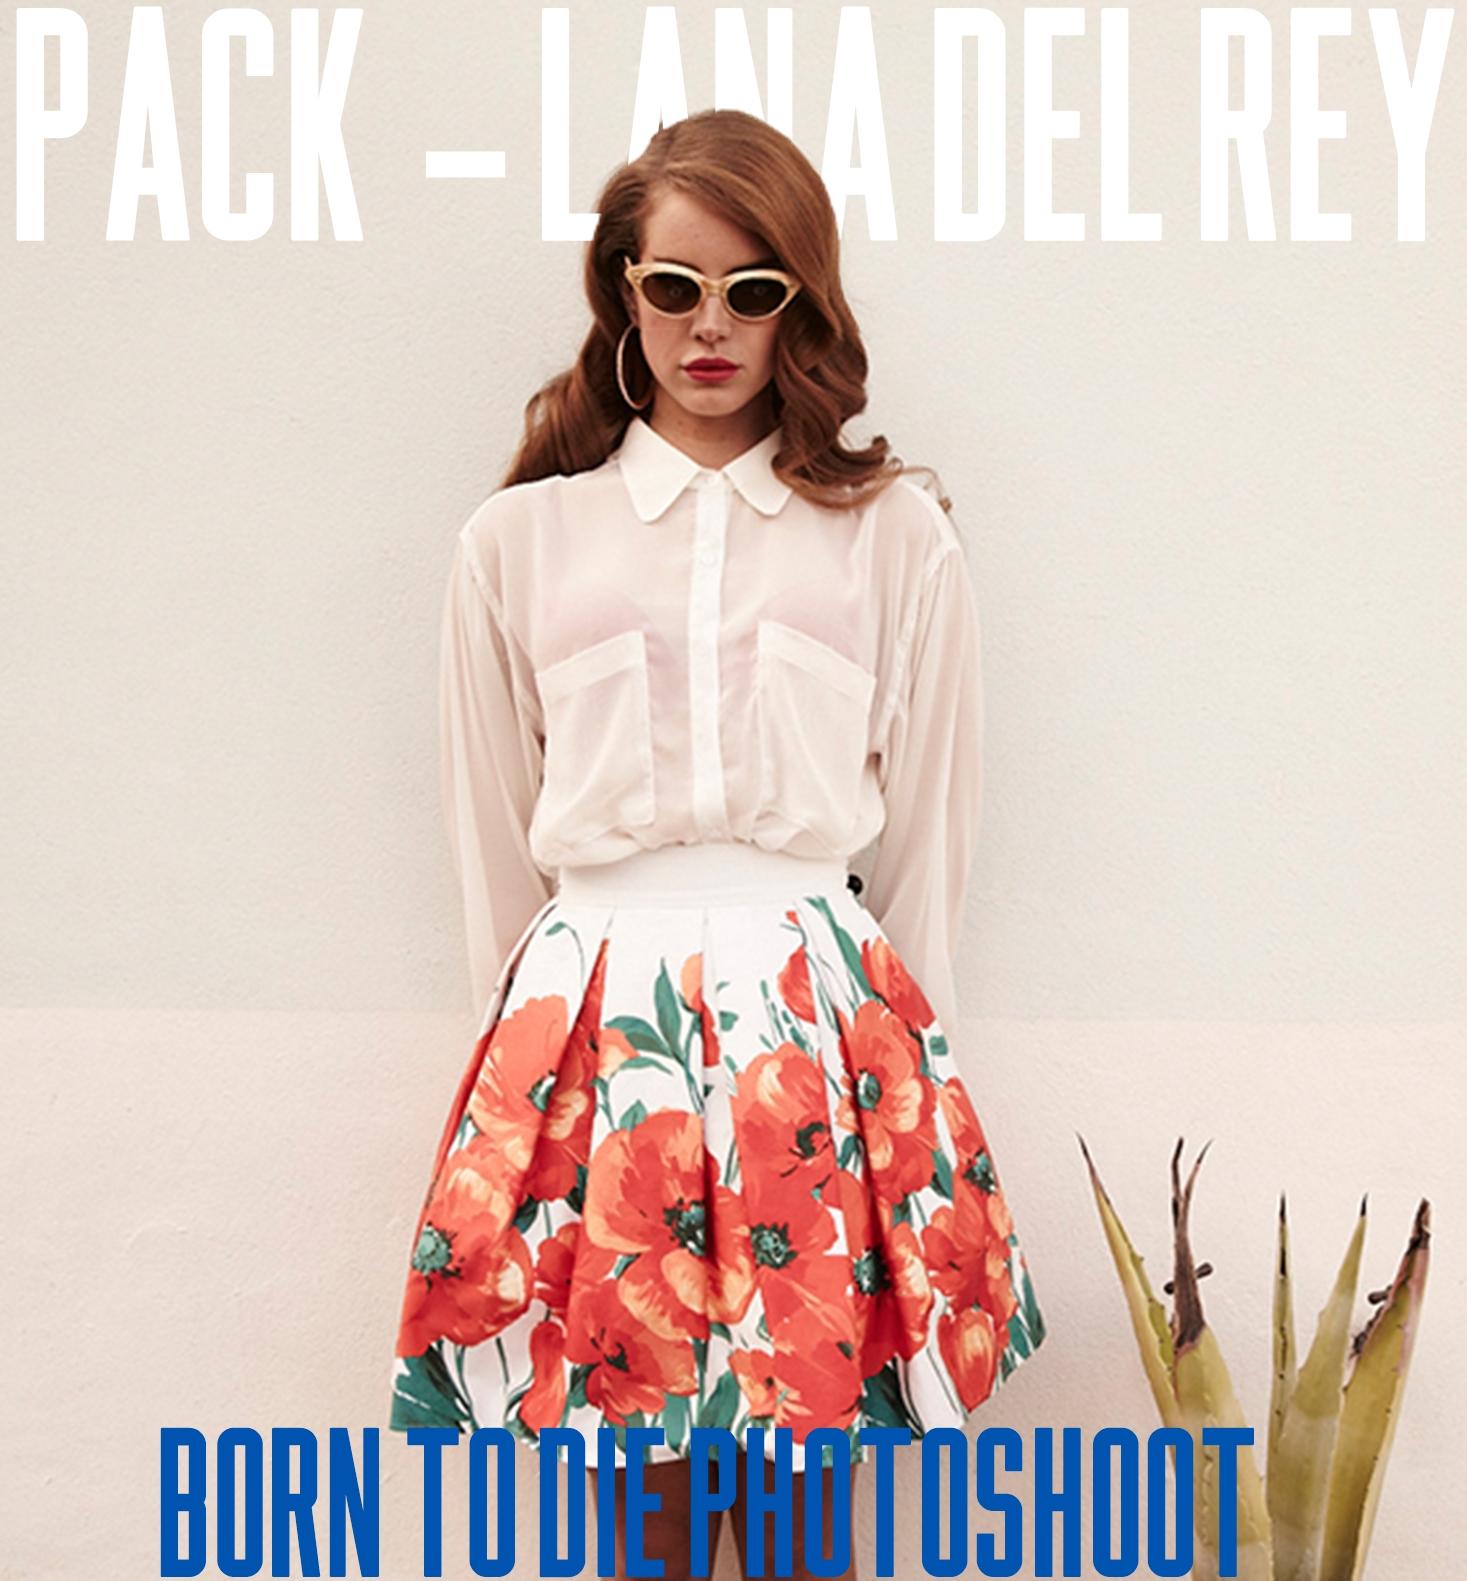 Pack Lana Del Rey Born To Die Photoshoot By Parkroseanne On Deviantart